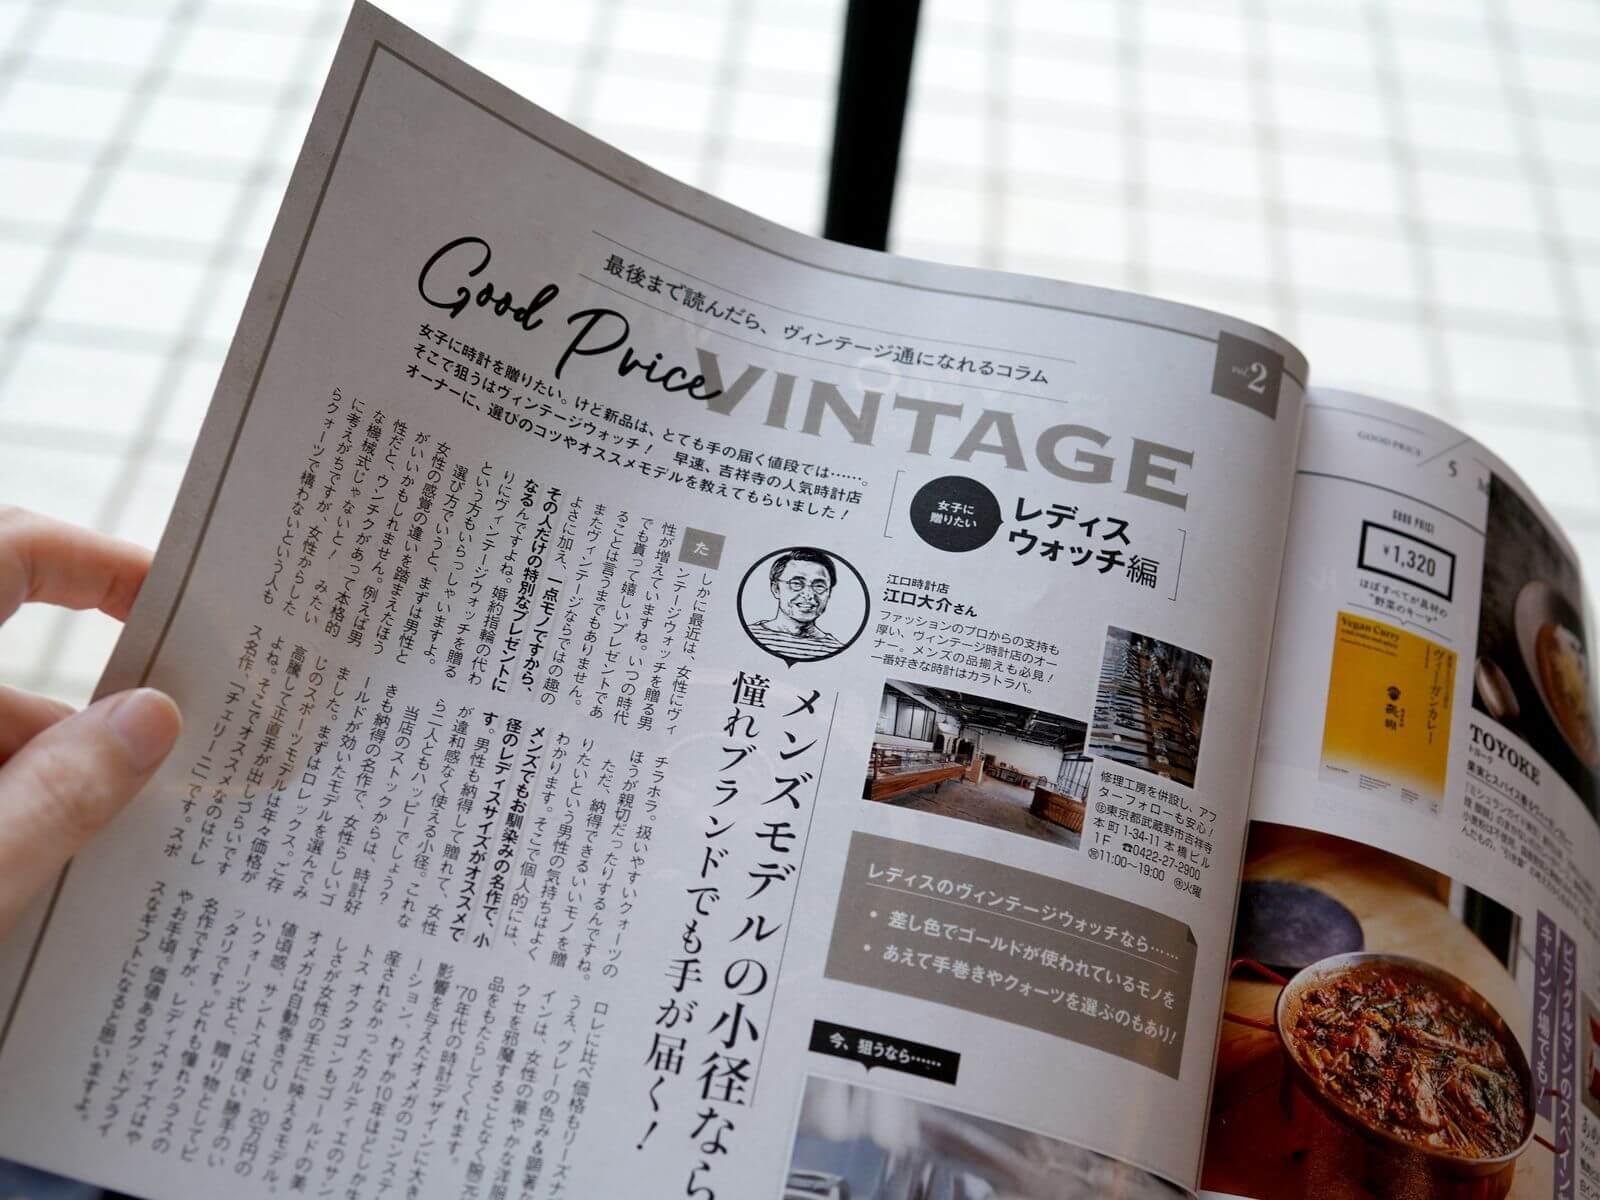 Begin No.393 安くていいモノ暮らし/ Good Price Vintage レディースウォッチ編